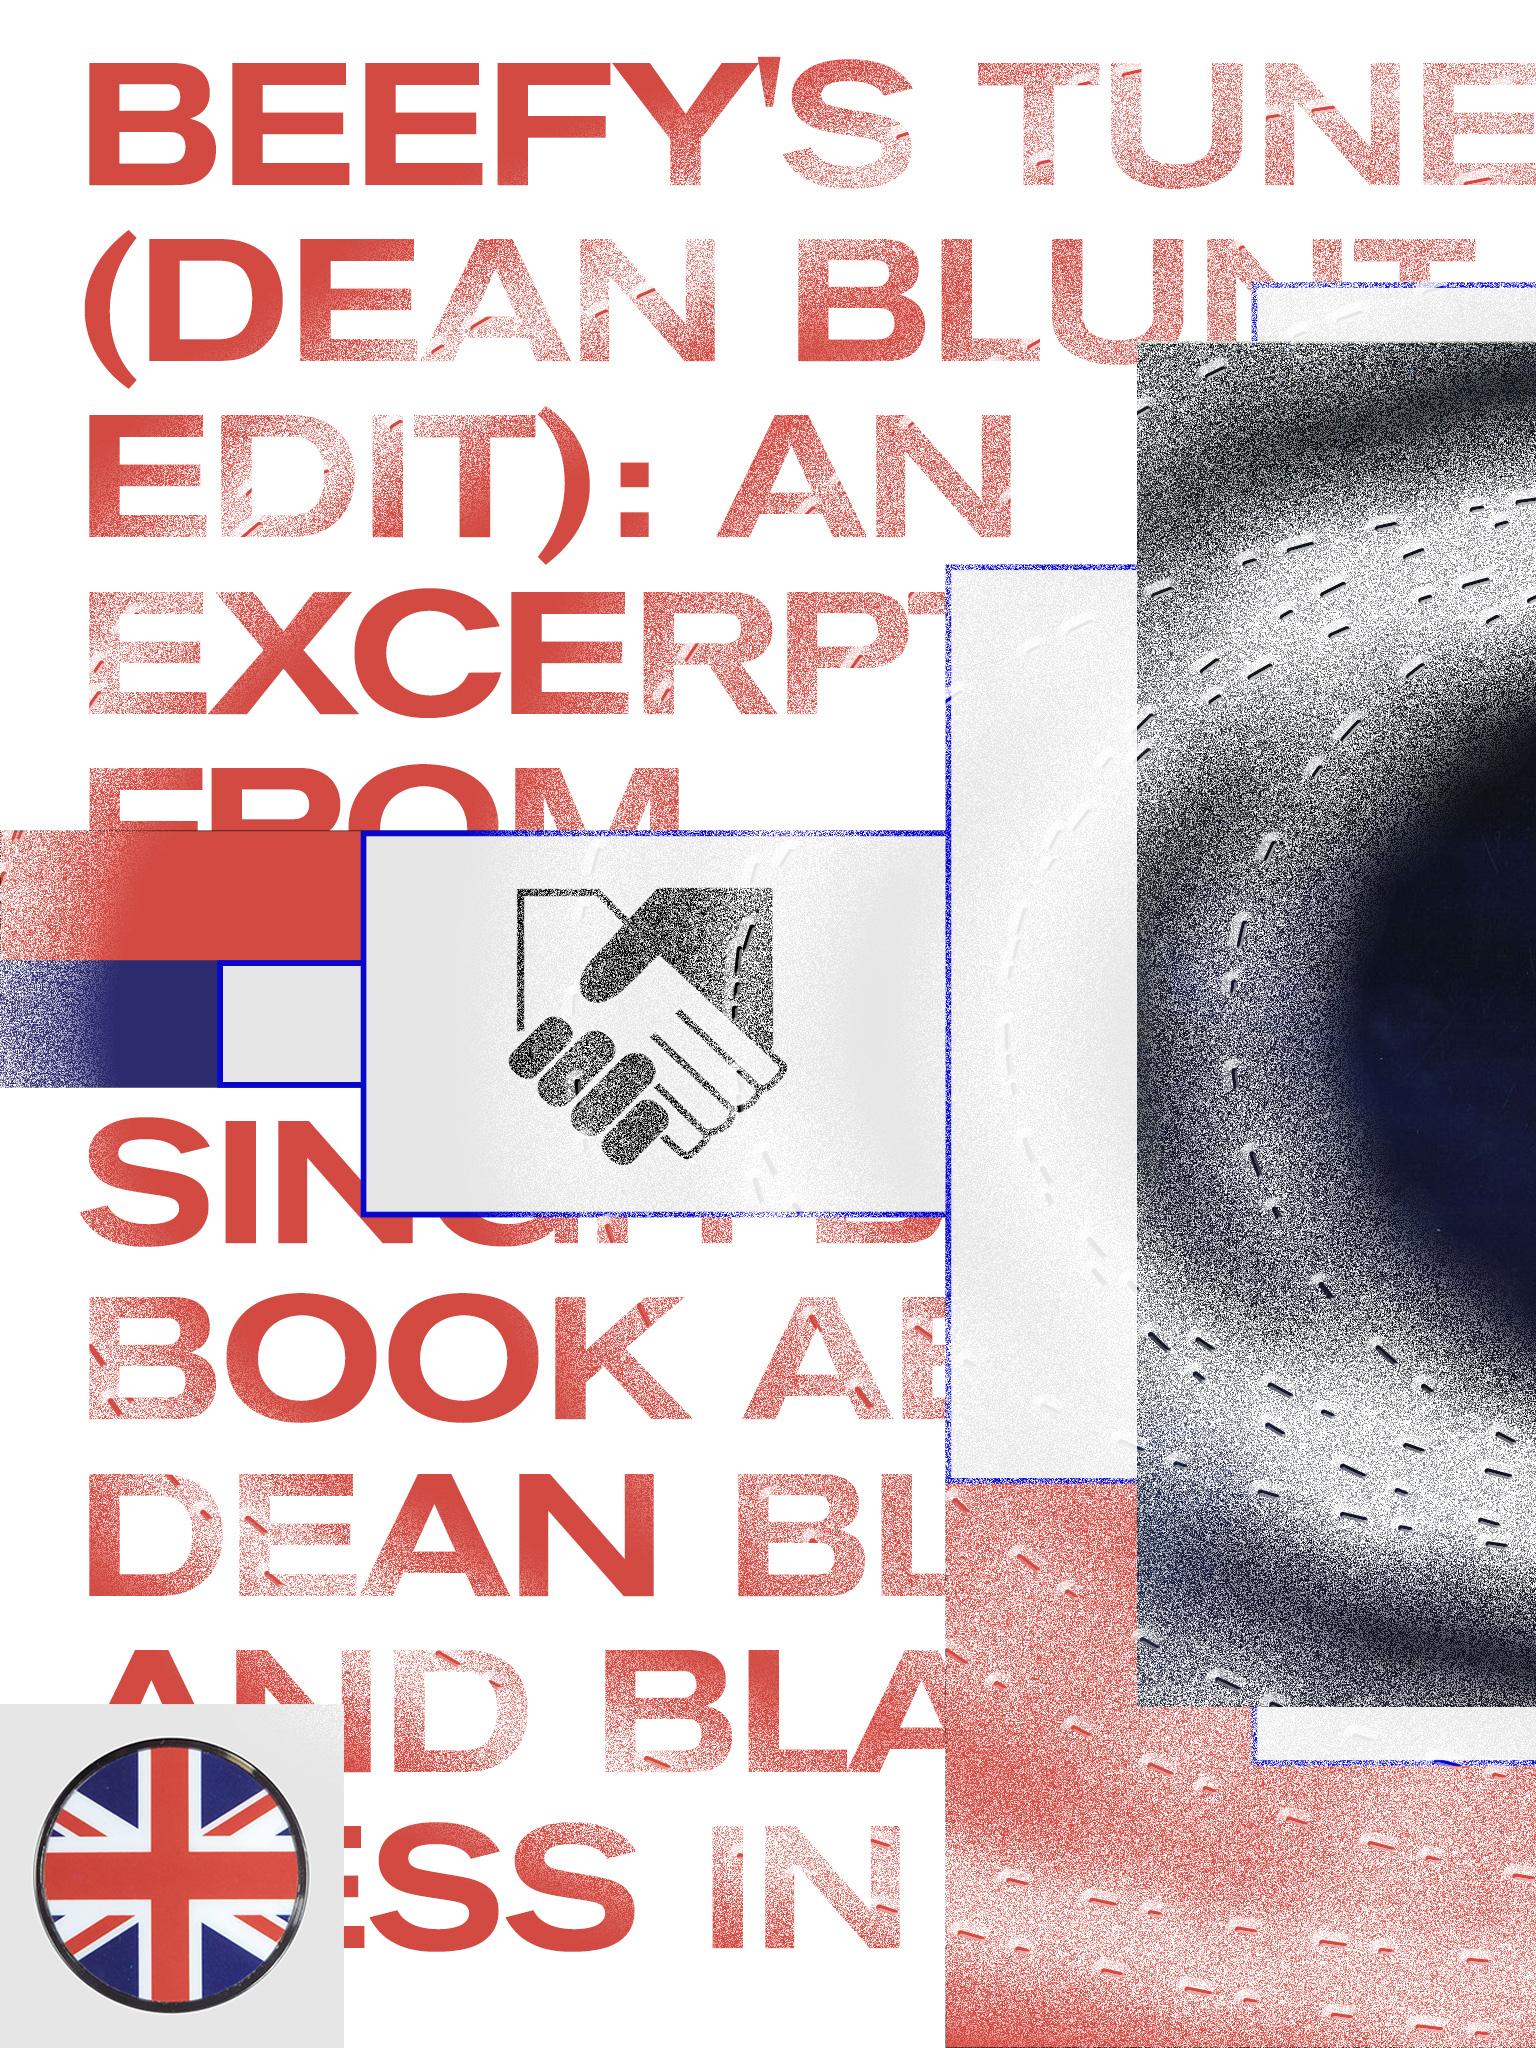 Beefy's Tune (Dean Blunt Edit): An Excerpt From Dhanveer Singh Brar's Book About Dean Blunt And Blackness In Britain